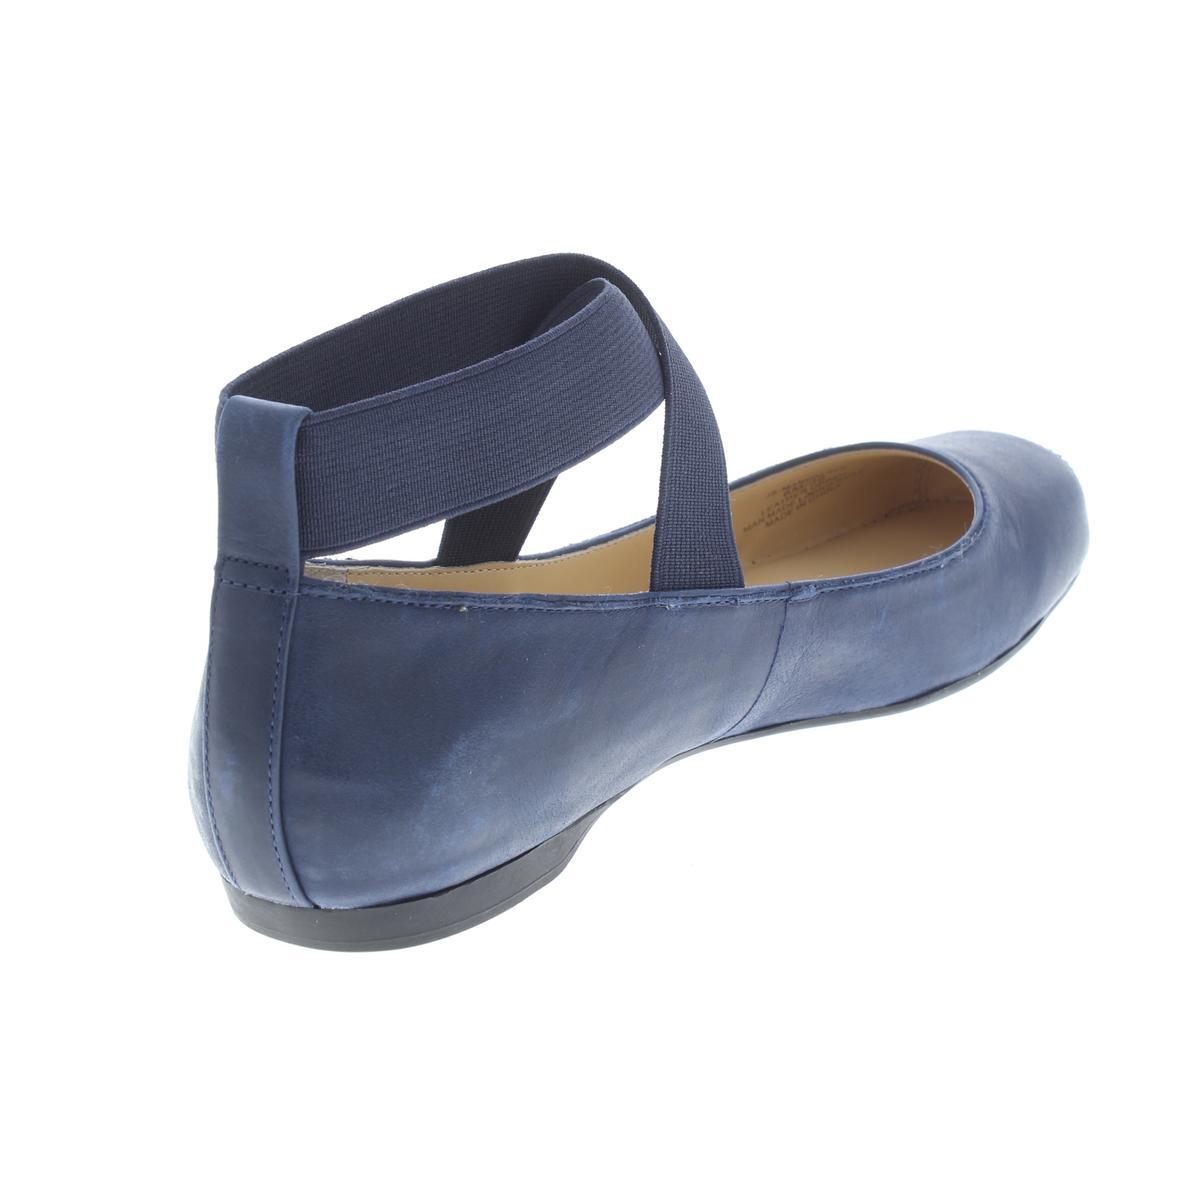 Jessica-Simpson-Women-039-s-Mandalaye-Square-Toe-Ankle-Wrap-Ballet-Flats thumbnail 16